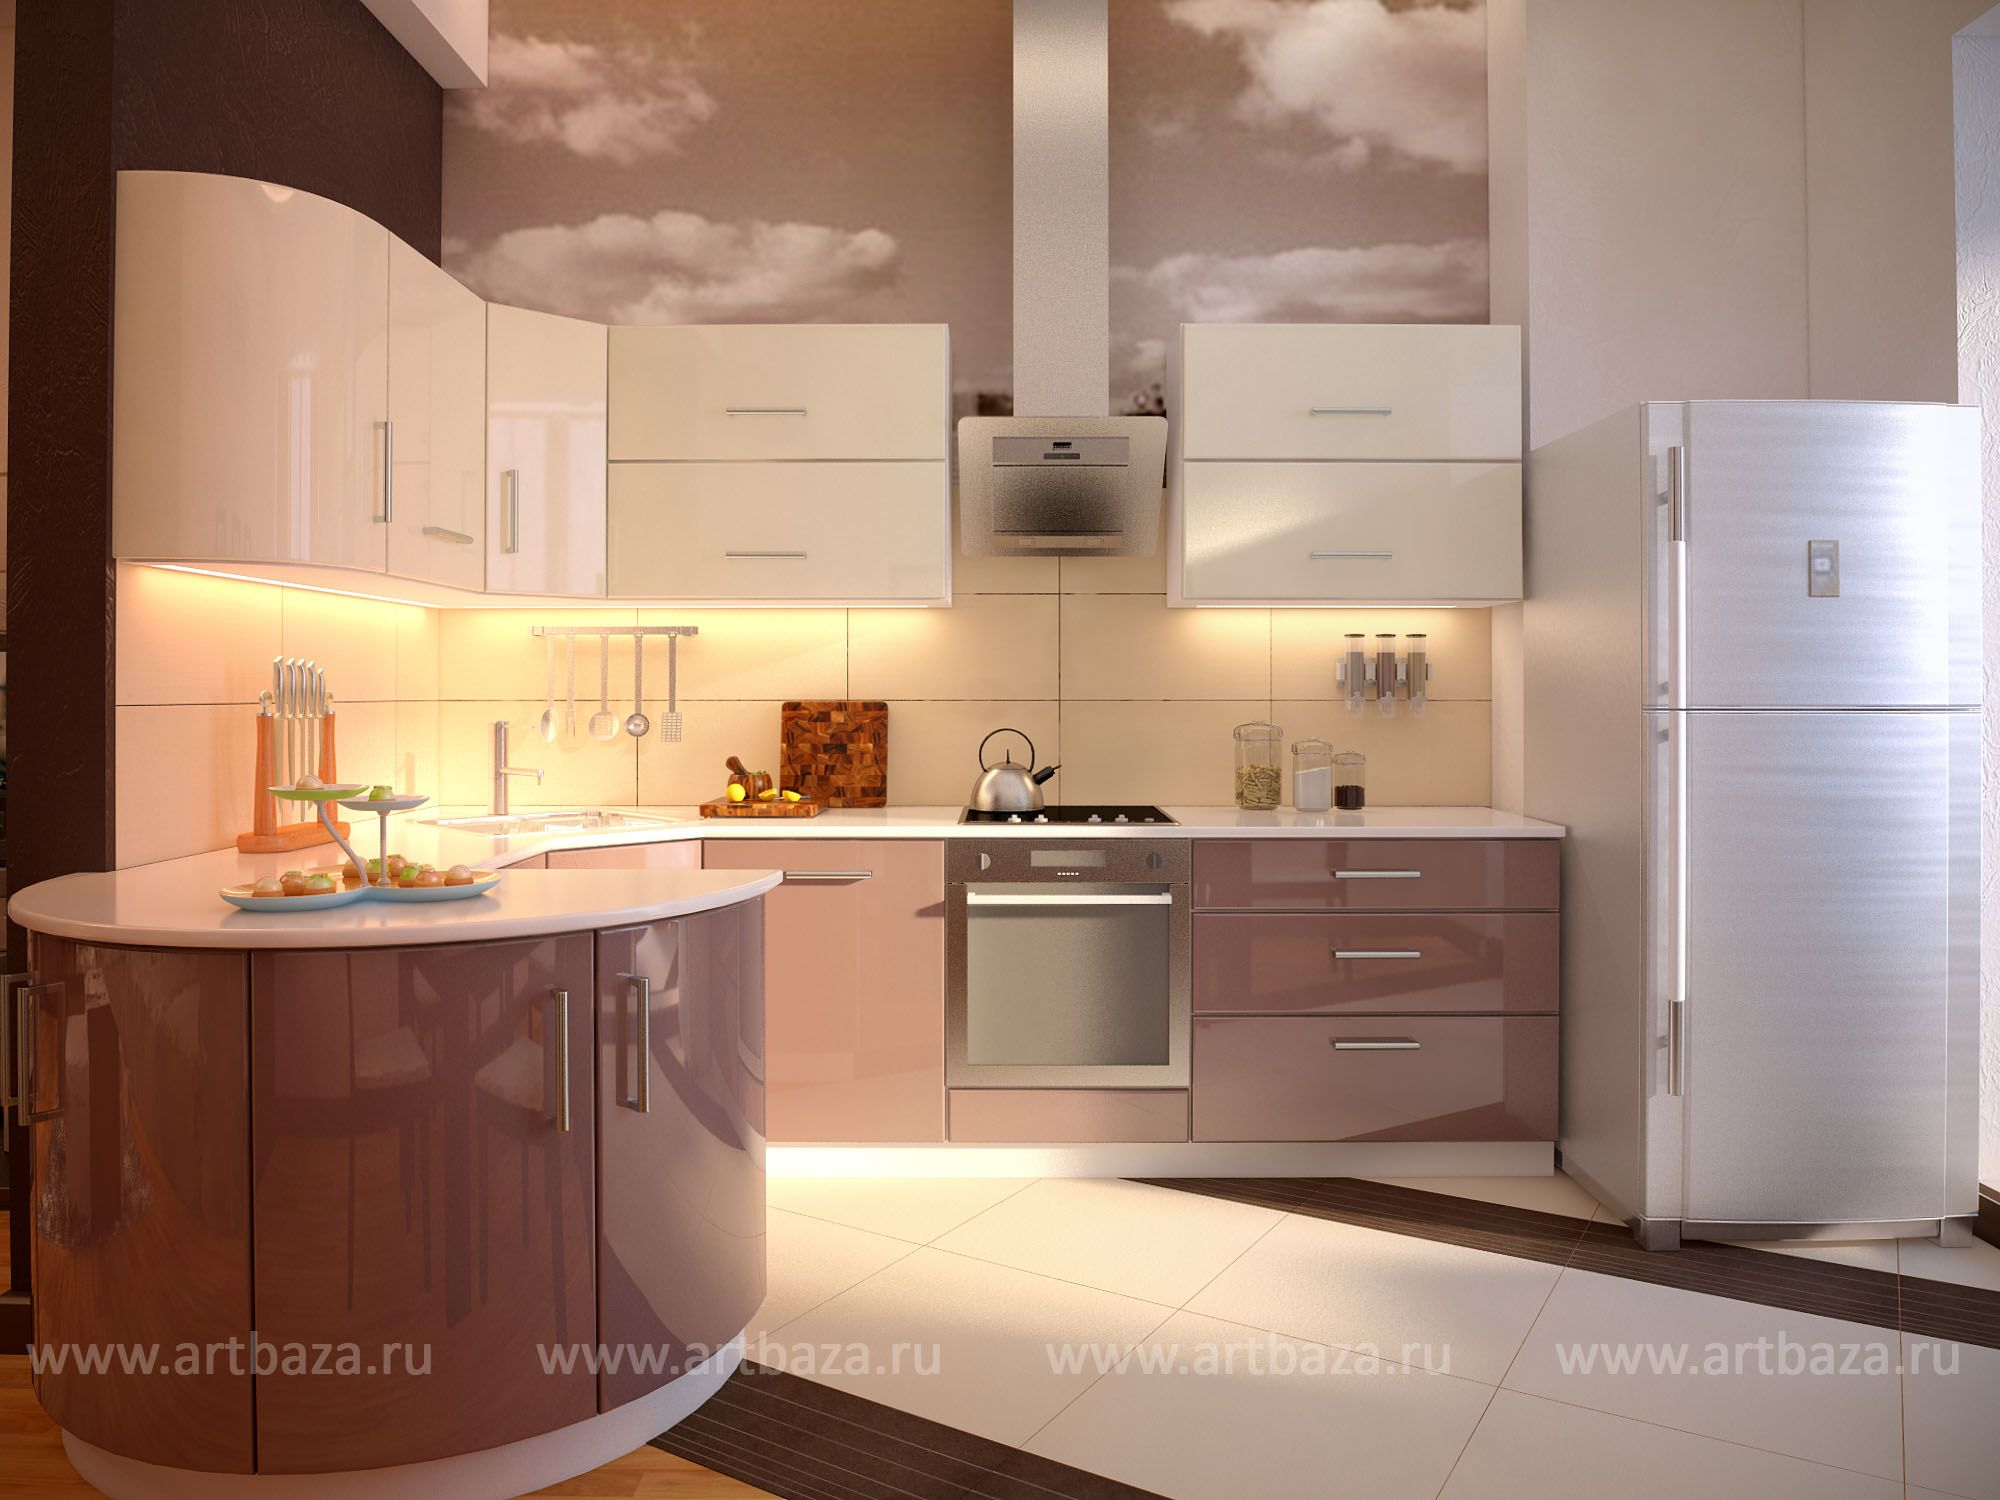 Dizain kuhni ru google mekl ana ideas for the house for Dizain home